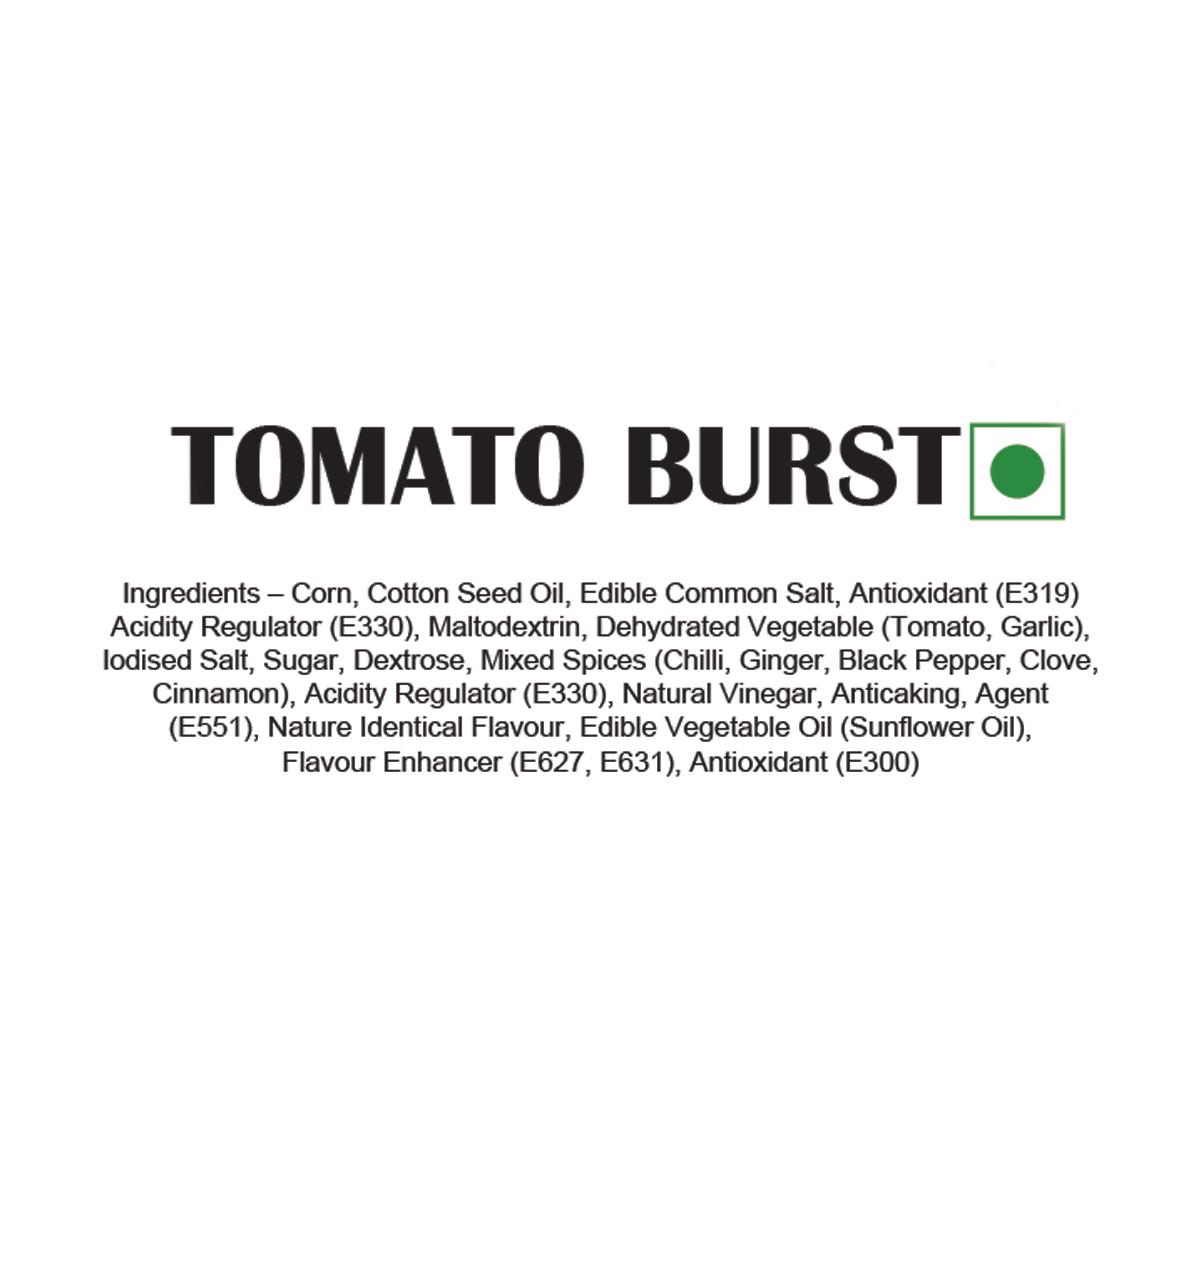 tomato brust igre side